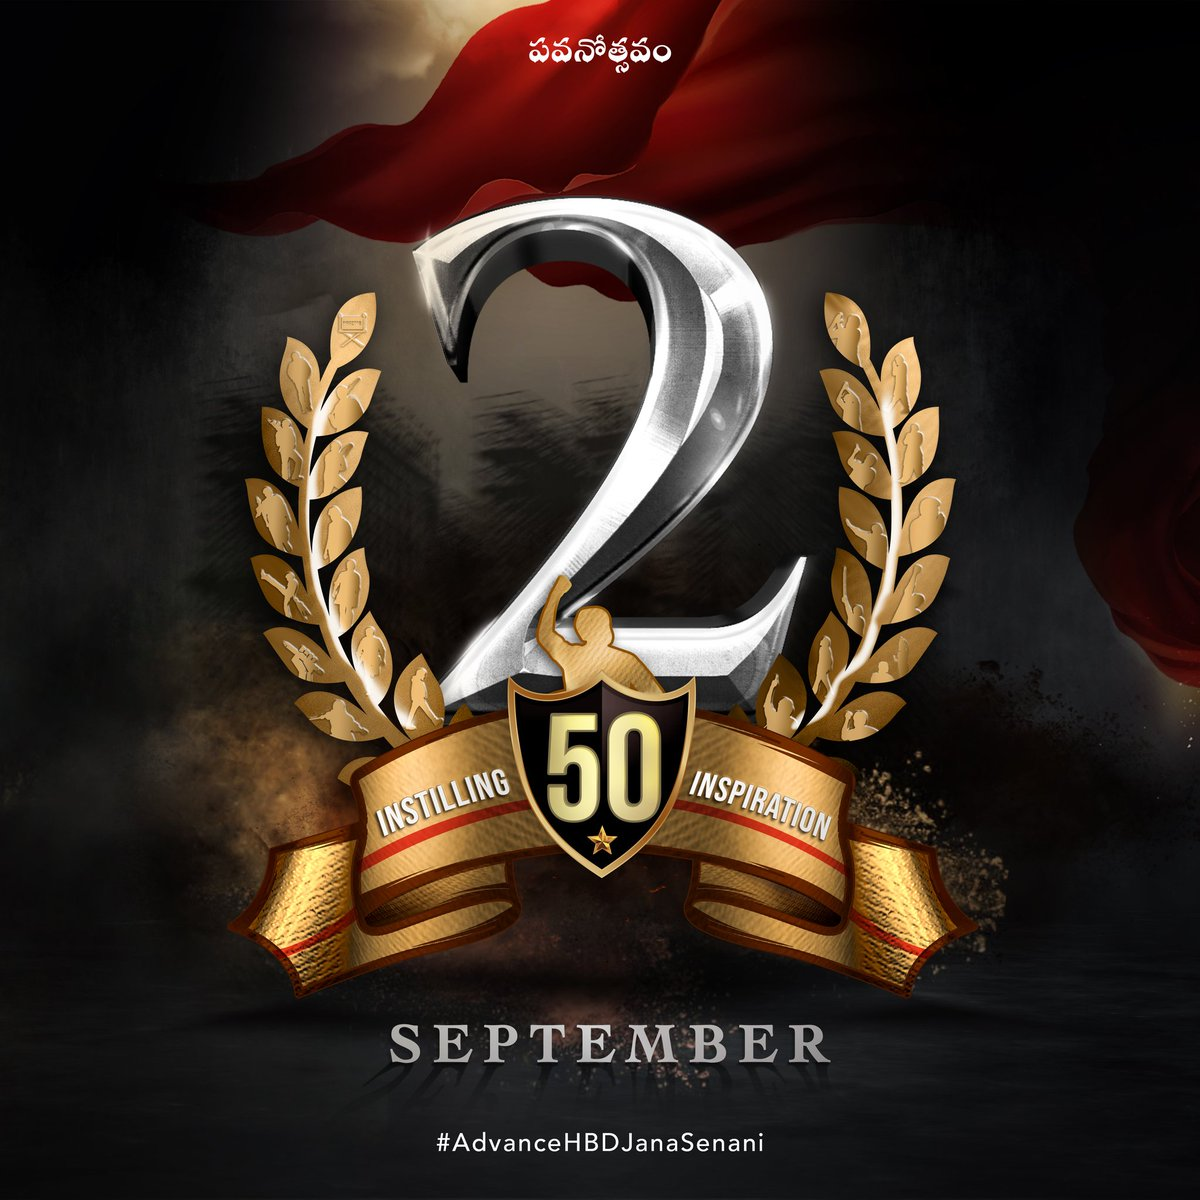 "Raghu punnam on Twitter: ""#AdvanceHBDJanaSenani @50 days to go @PawanKalyan  birthday @CDP @God Kalyan💯❣️🤩 https://t.co/VTjzWzeEut"" / Twitter"